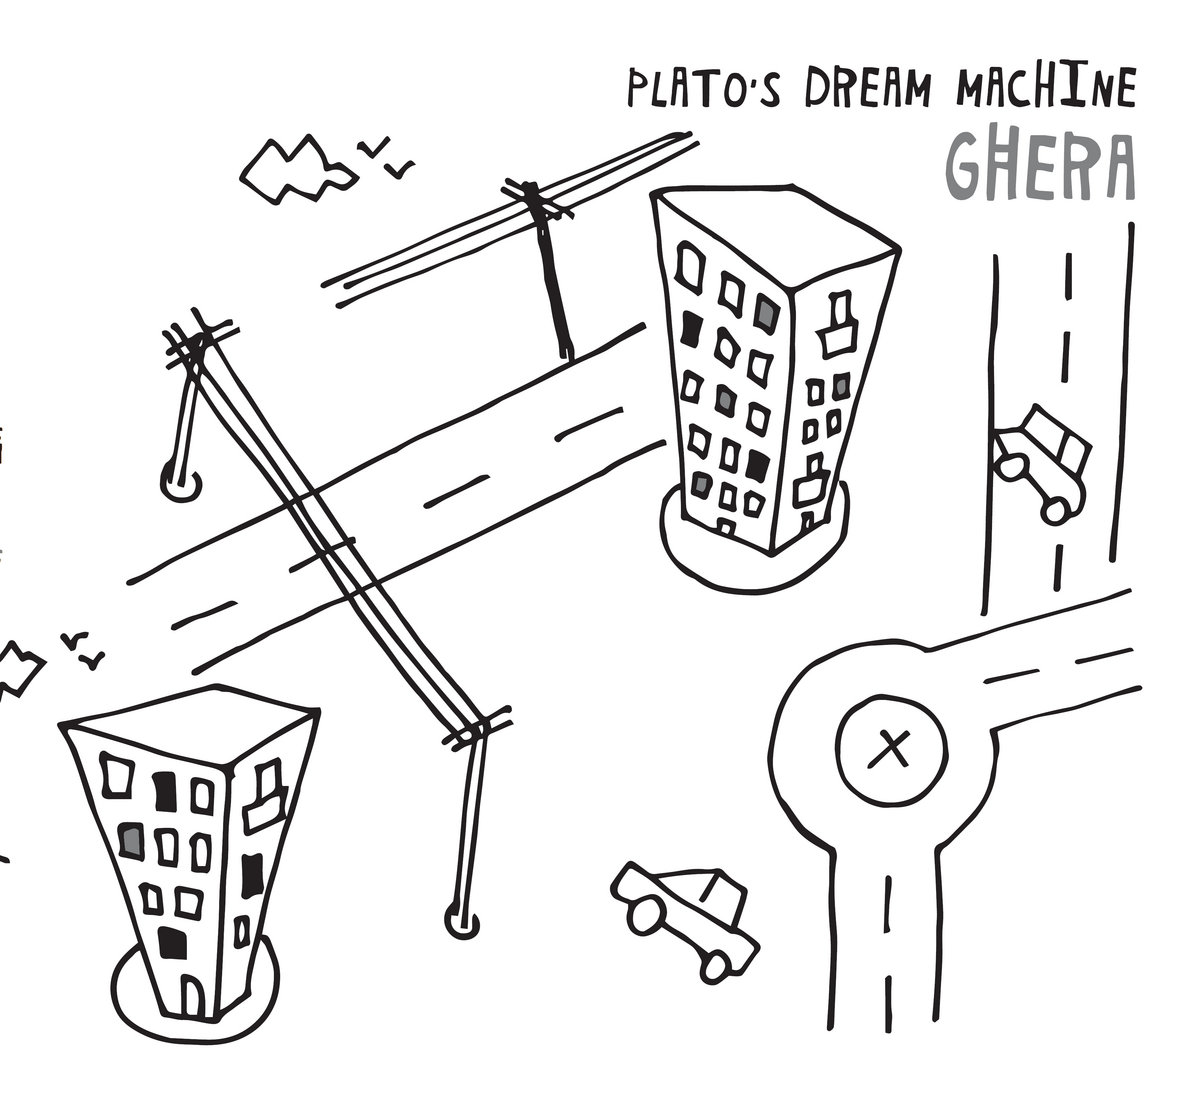 hight resolution of from g era by plato s dream machine